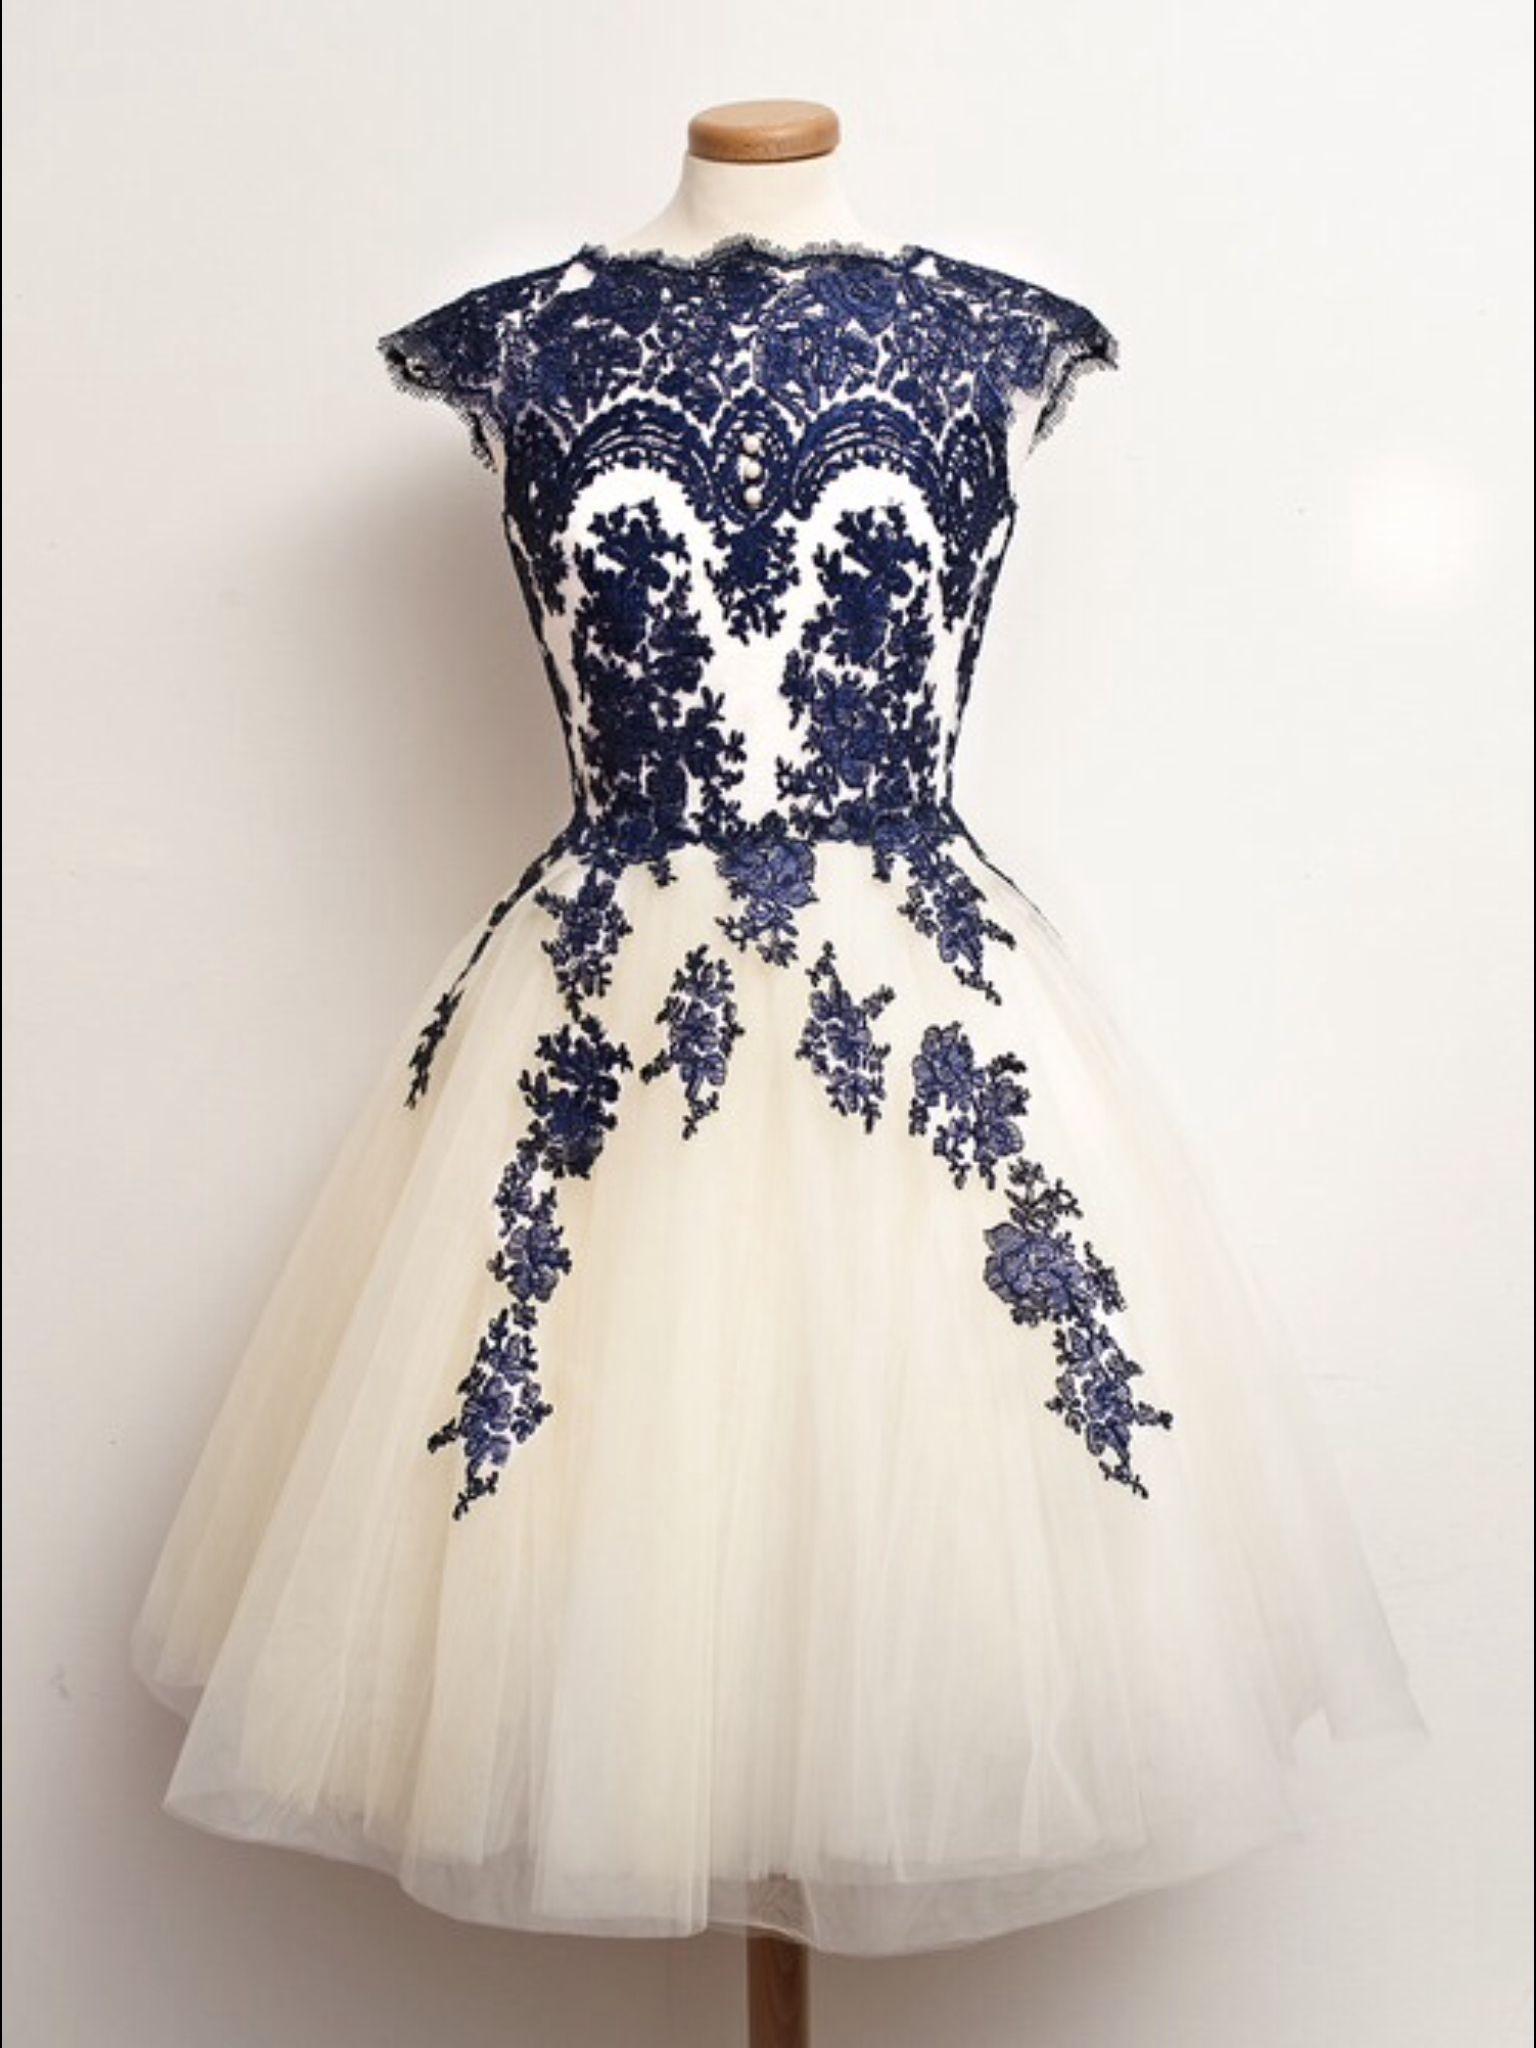 Pin by aly caldera on prom pinterest dream wedding dresses